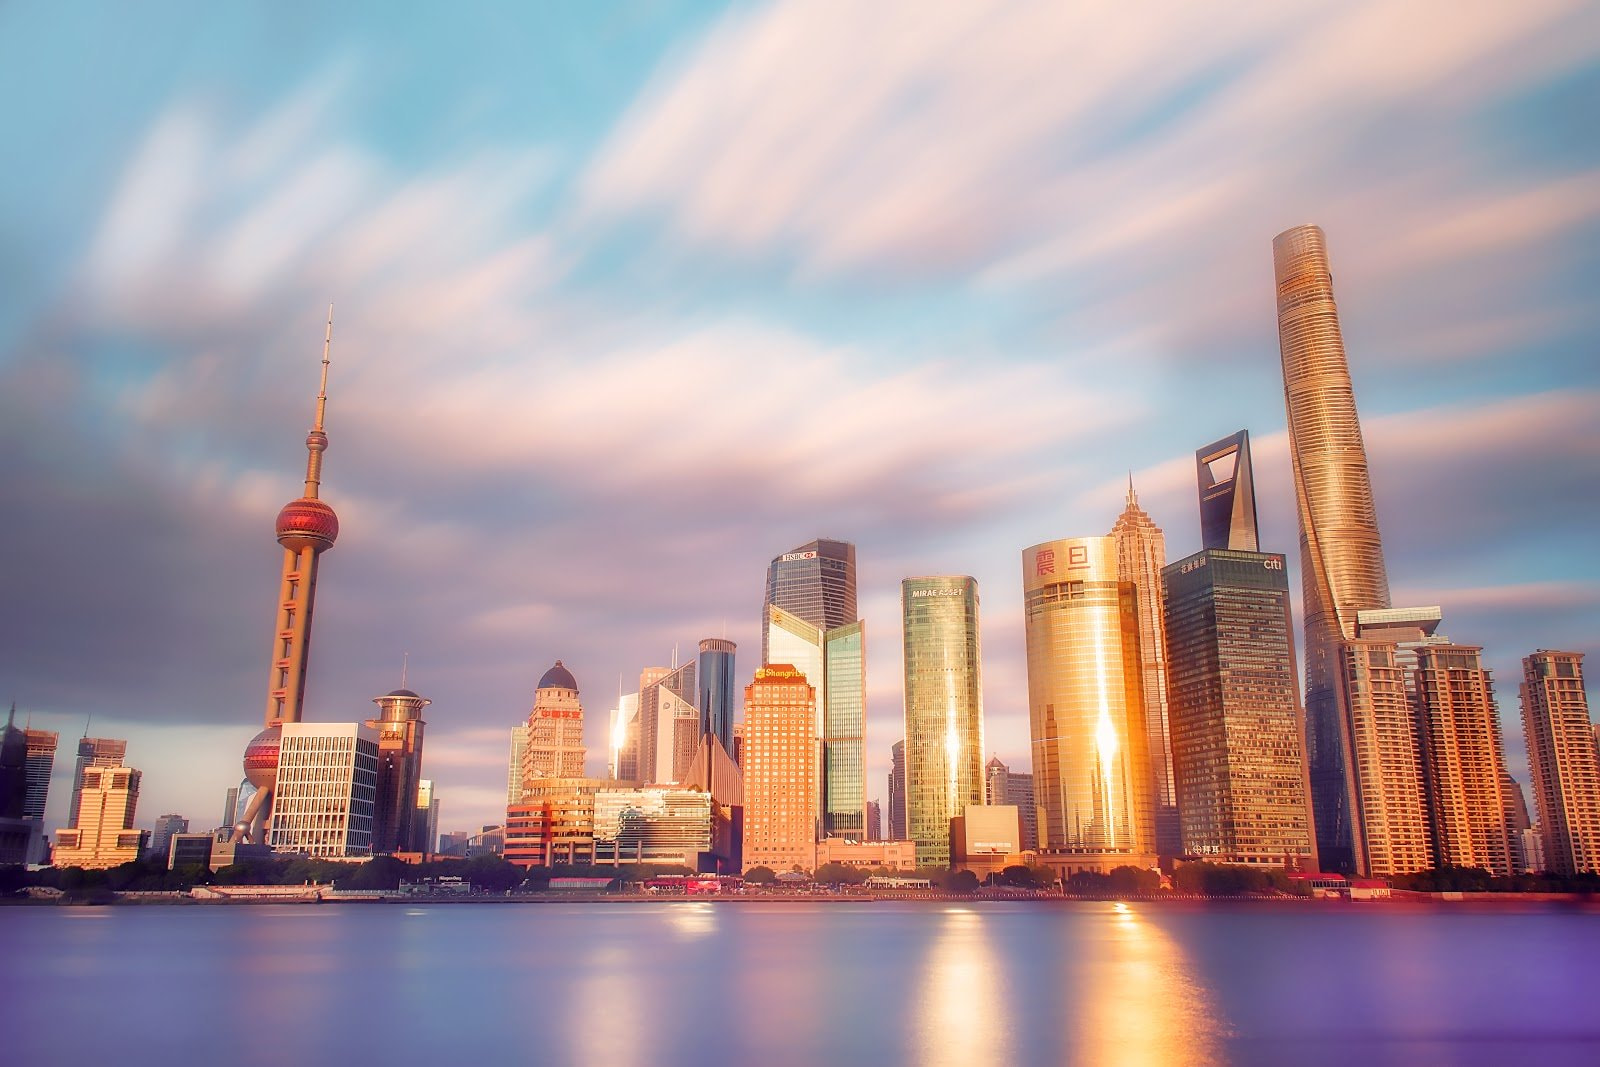 City skyline by Zhang Kaiyv